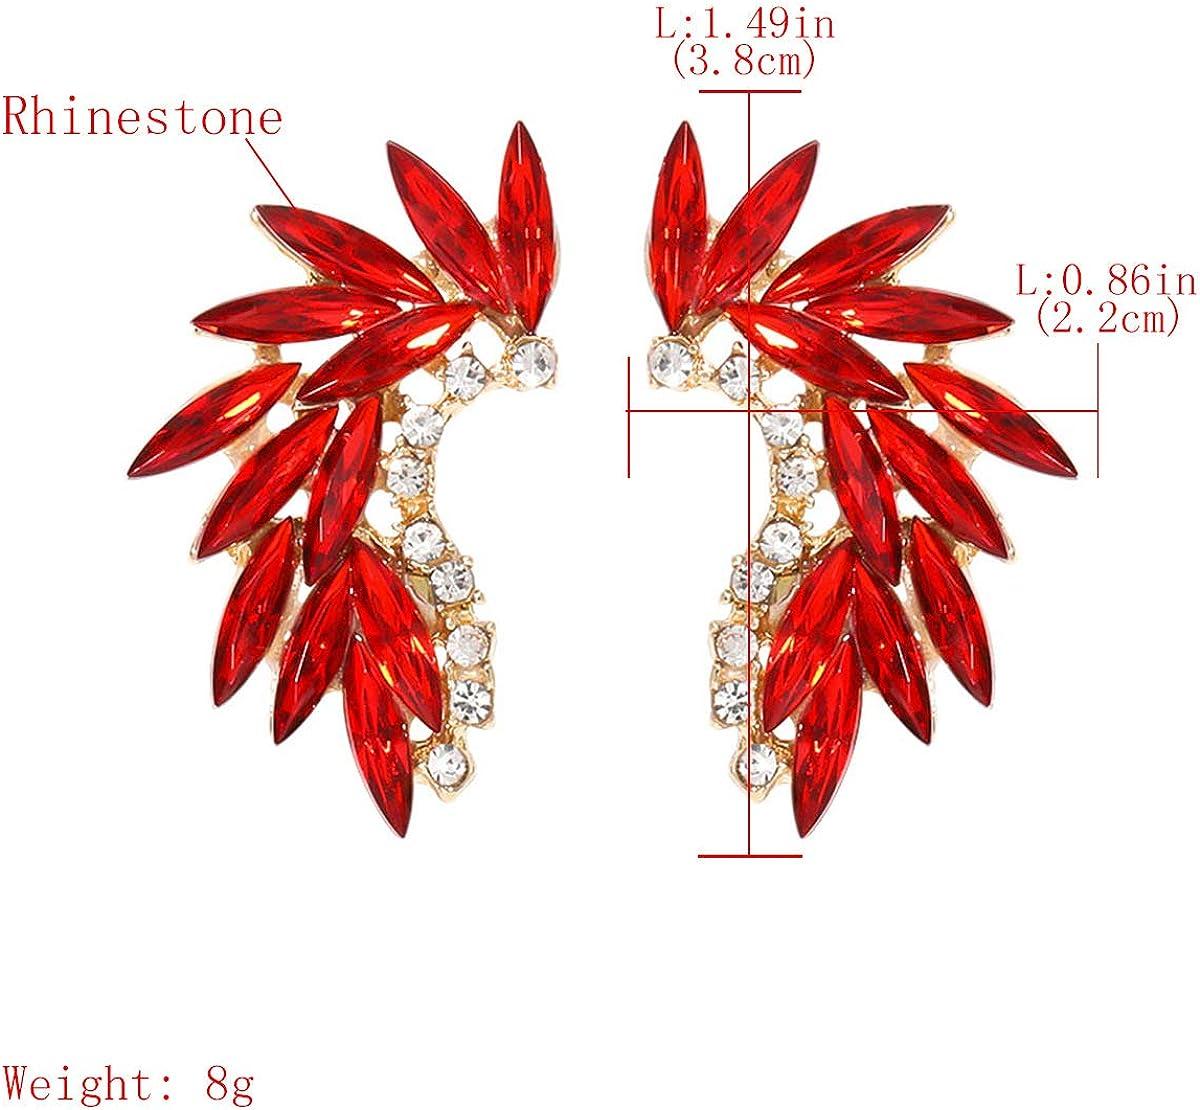 HUATRK Rhinestone Camber Gold/Red/Clear Wings Minimalism Earrings for Women Girls